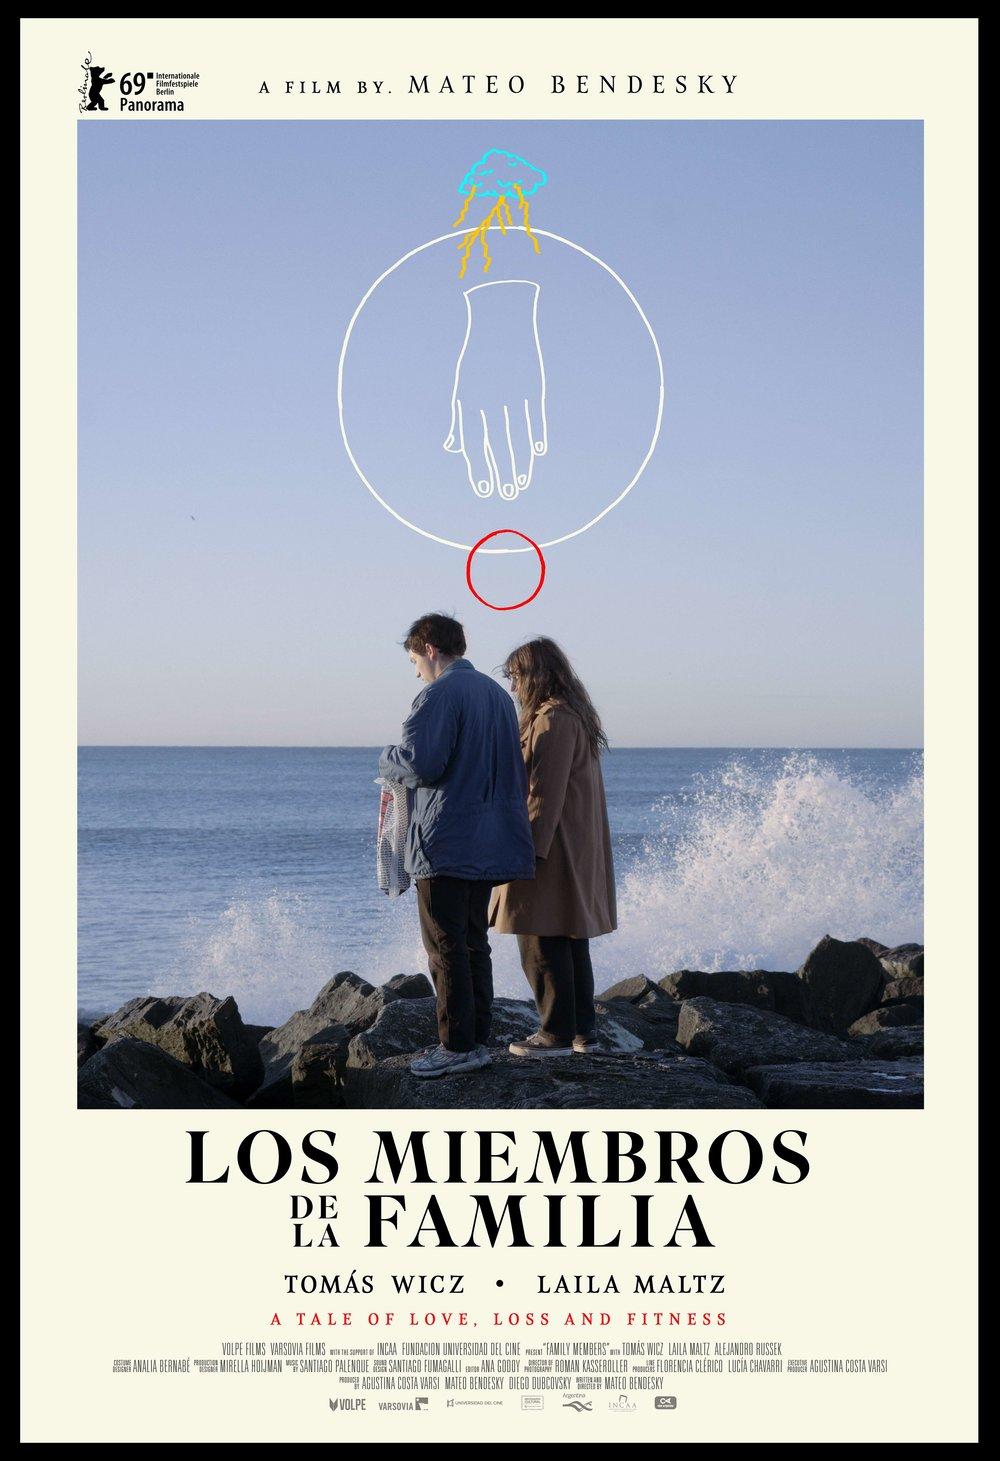 Family_Members_Spanish_Hybrid_003_low.jpg